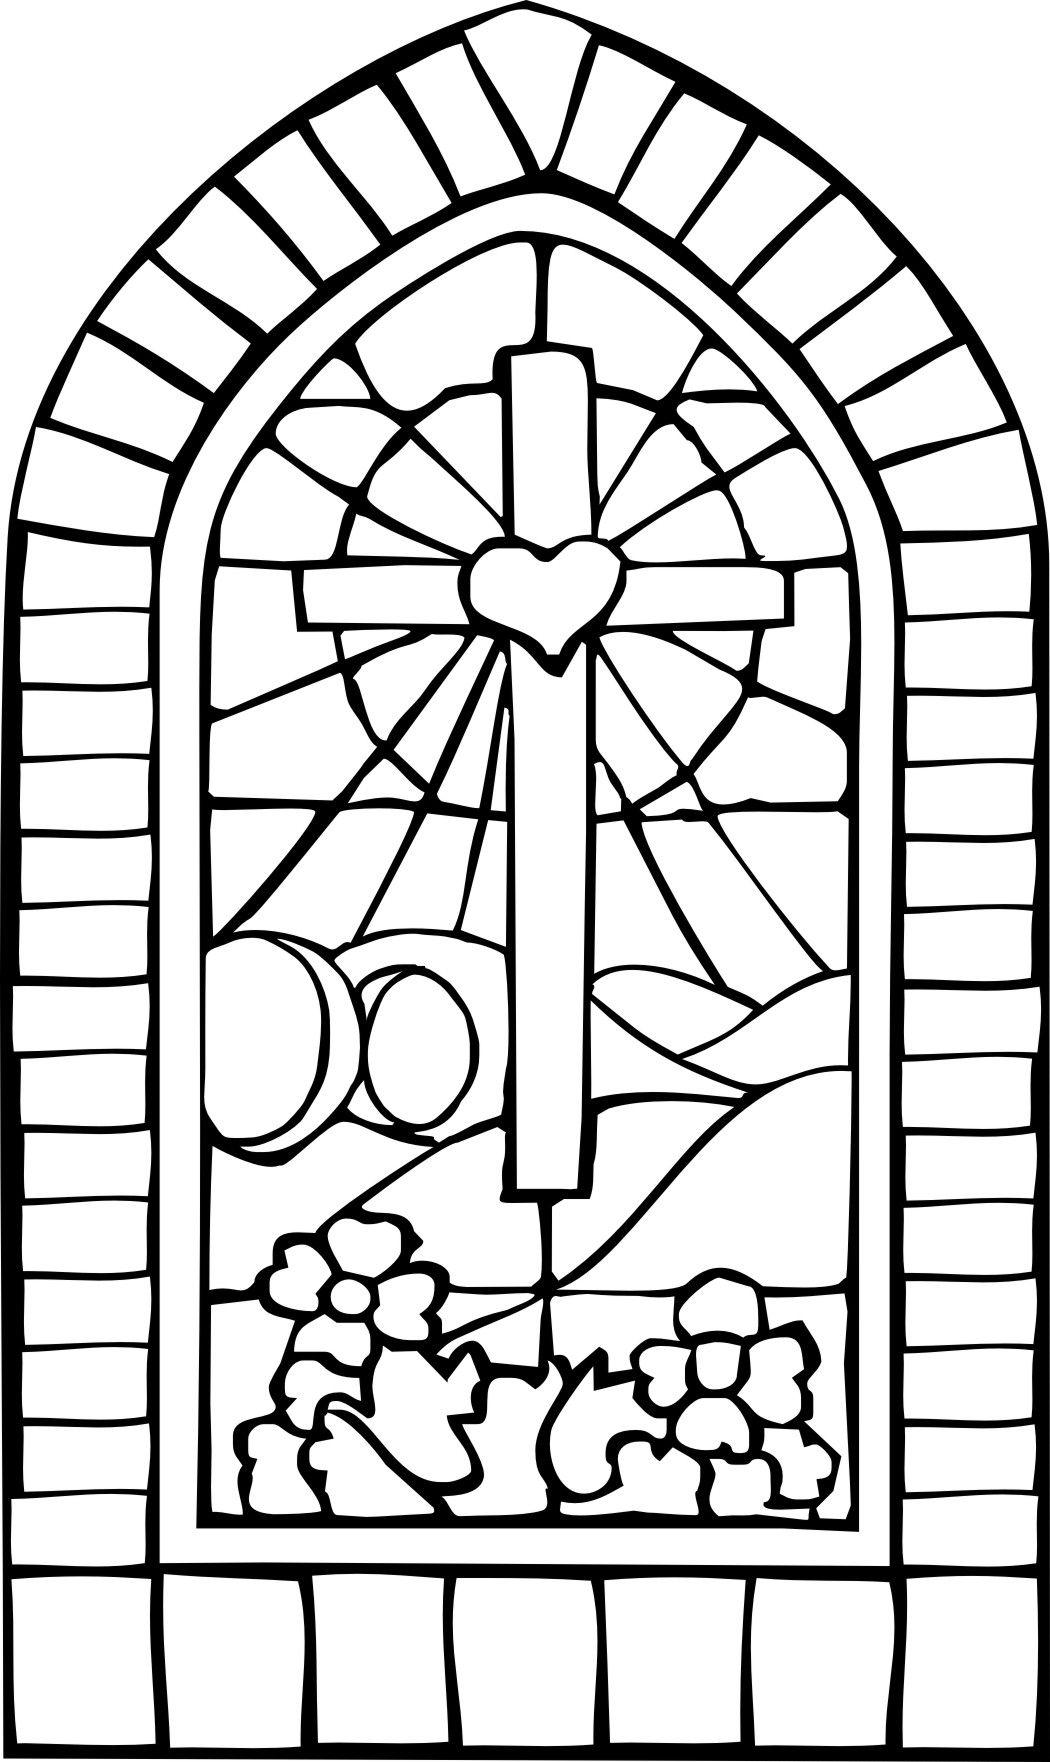 Pin By Emily Steinle On Children S Church Ideas